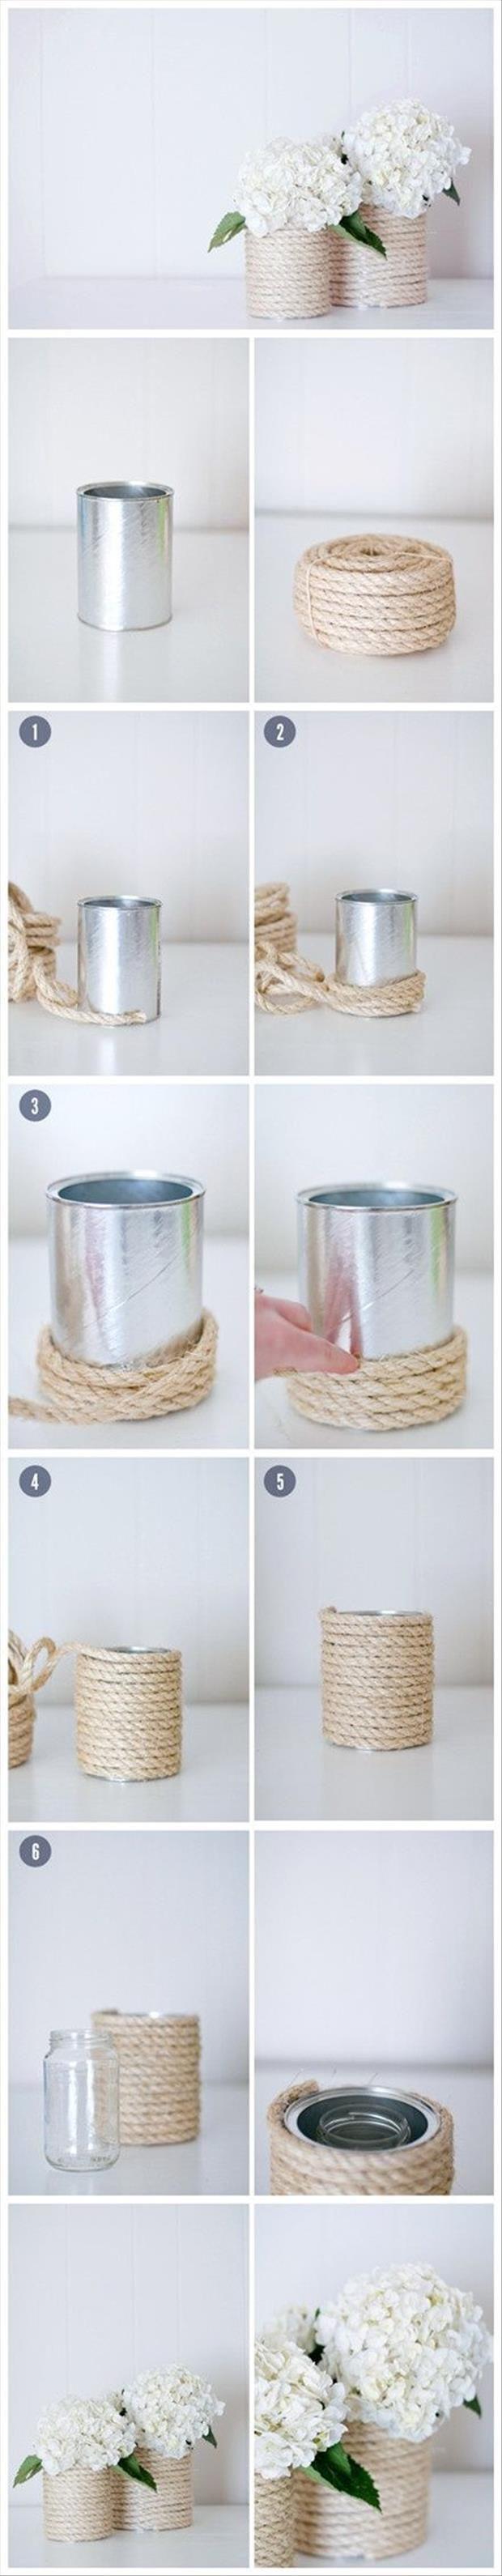 hágalo usted mismo Craft Ideas (2)